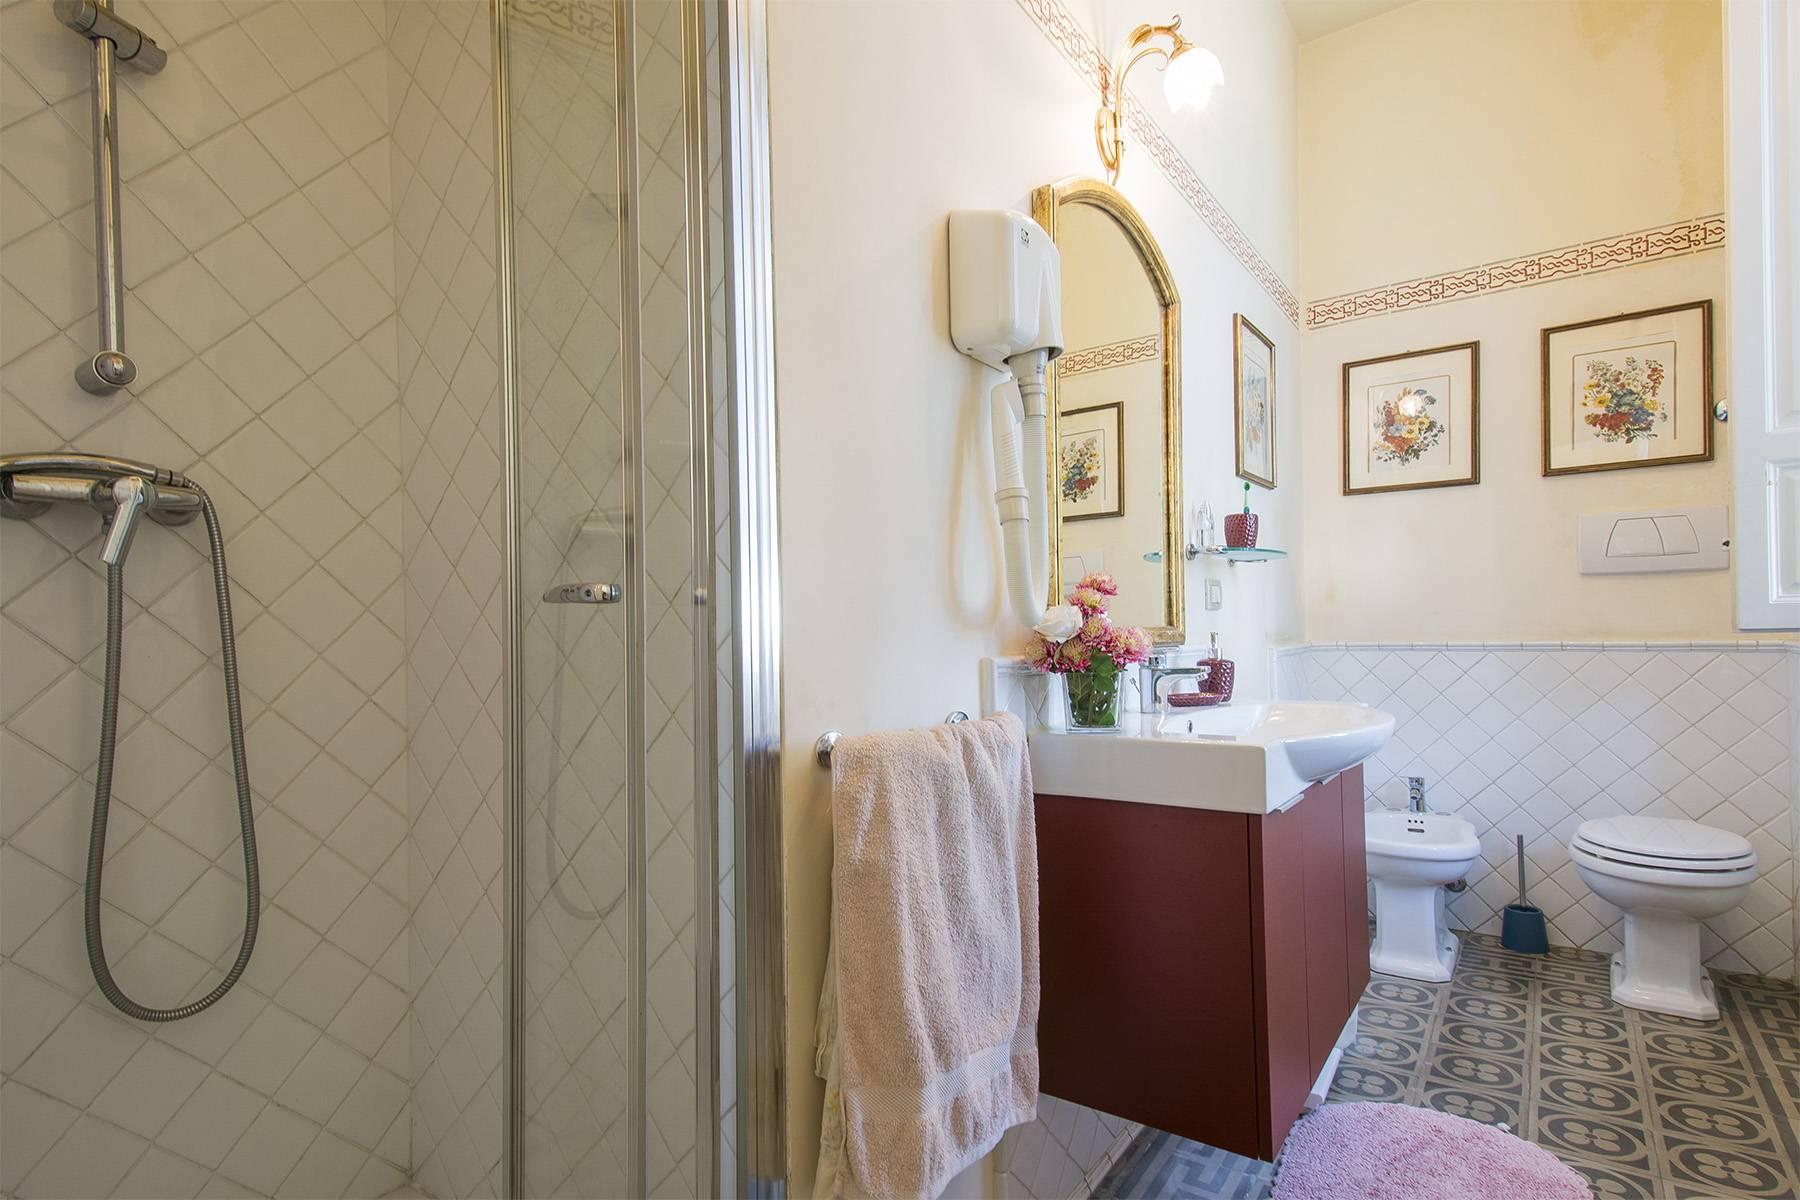 Villa in Vendita a Lucca: 5 locali, 350 mq - Foto 14